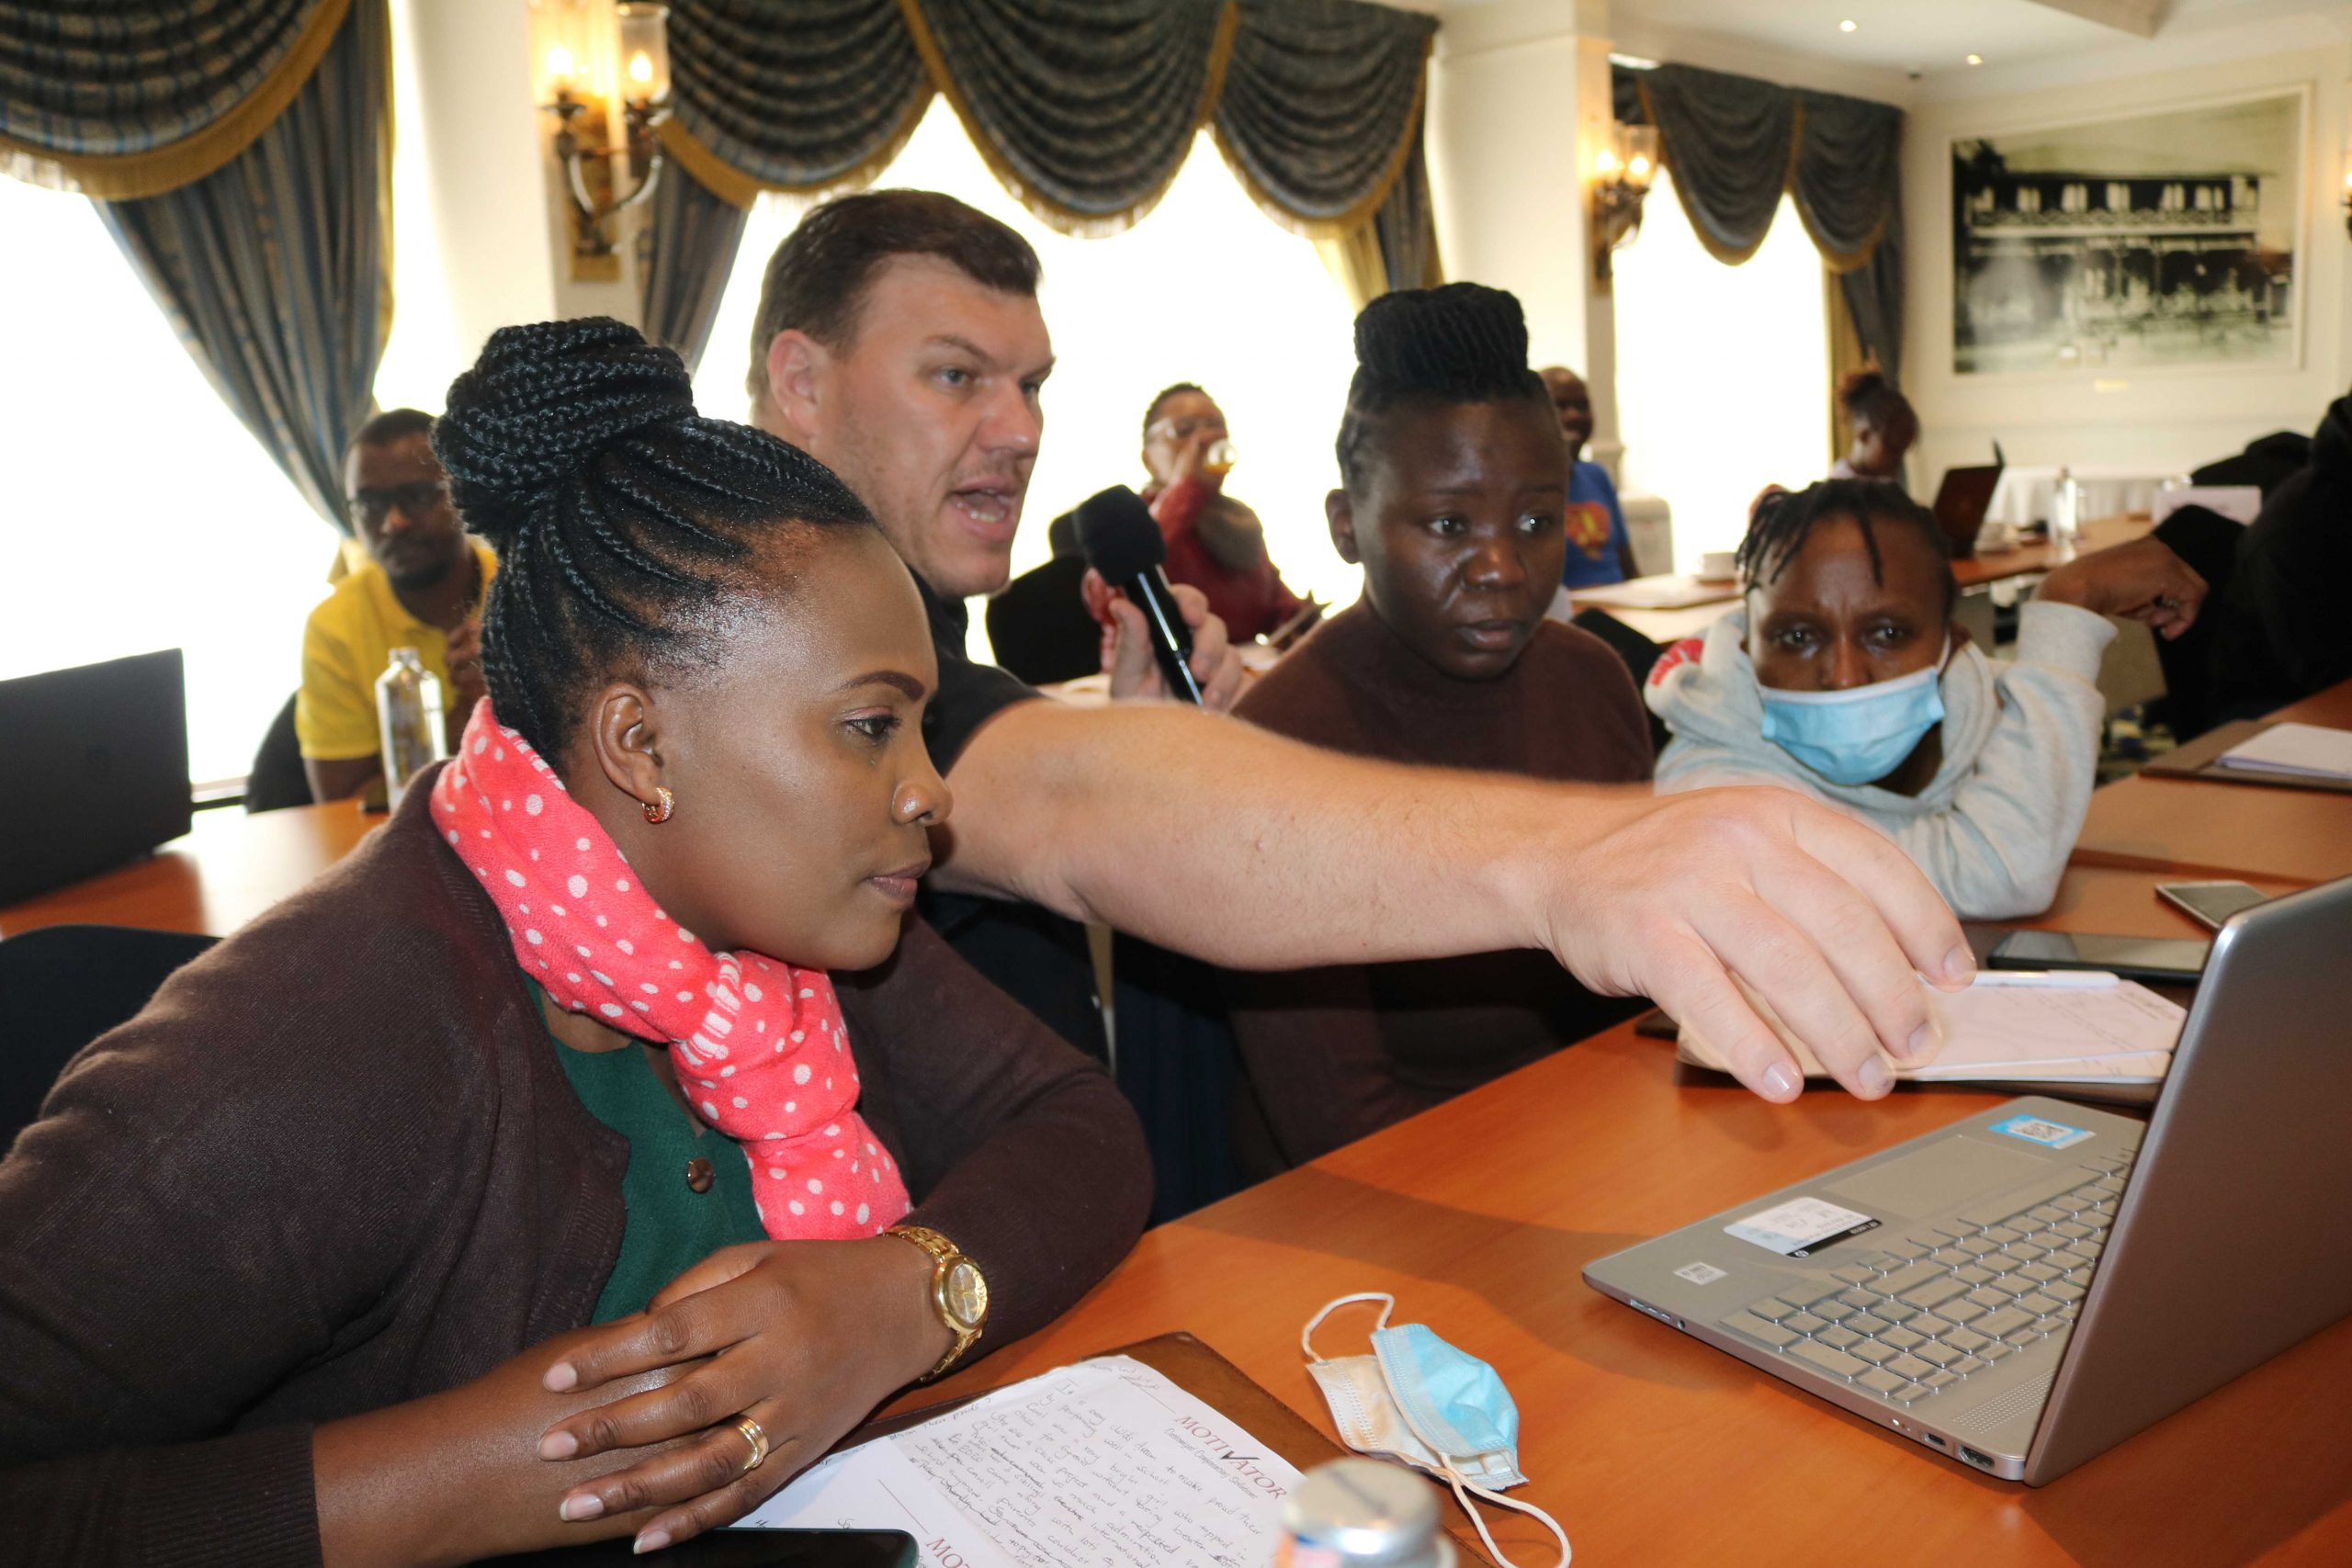 USAGM offers training in Nairobi, Kenya